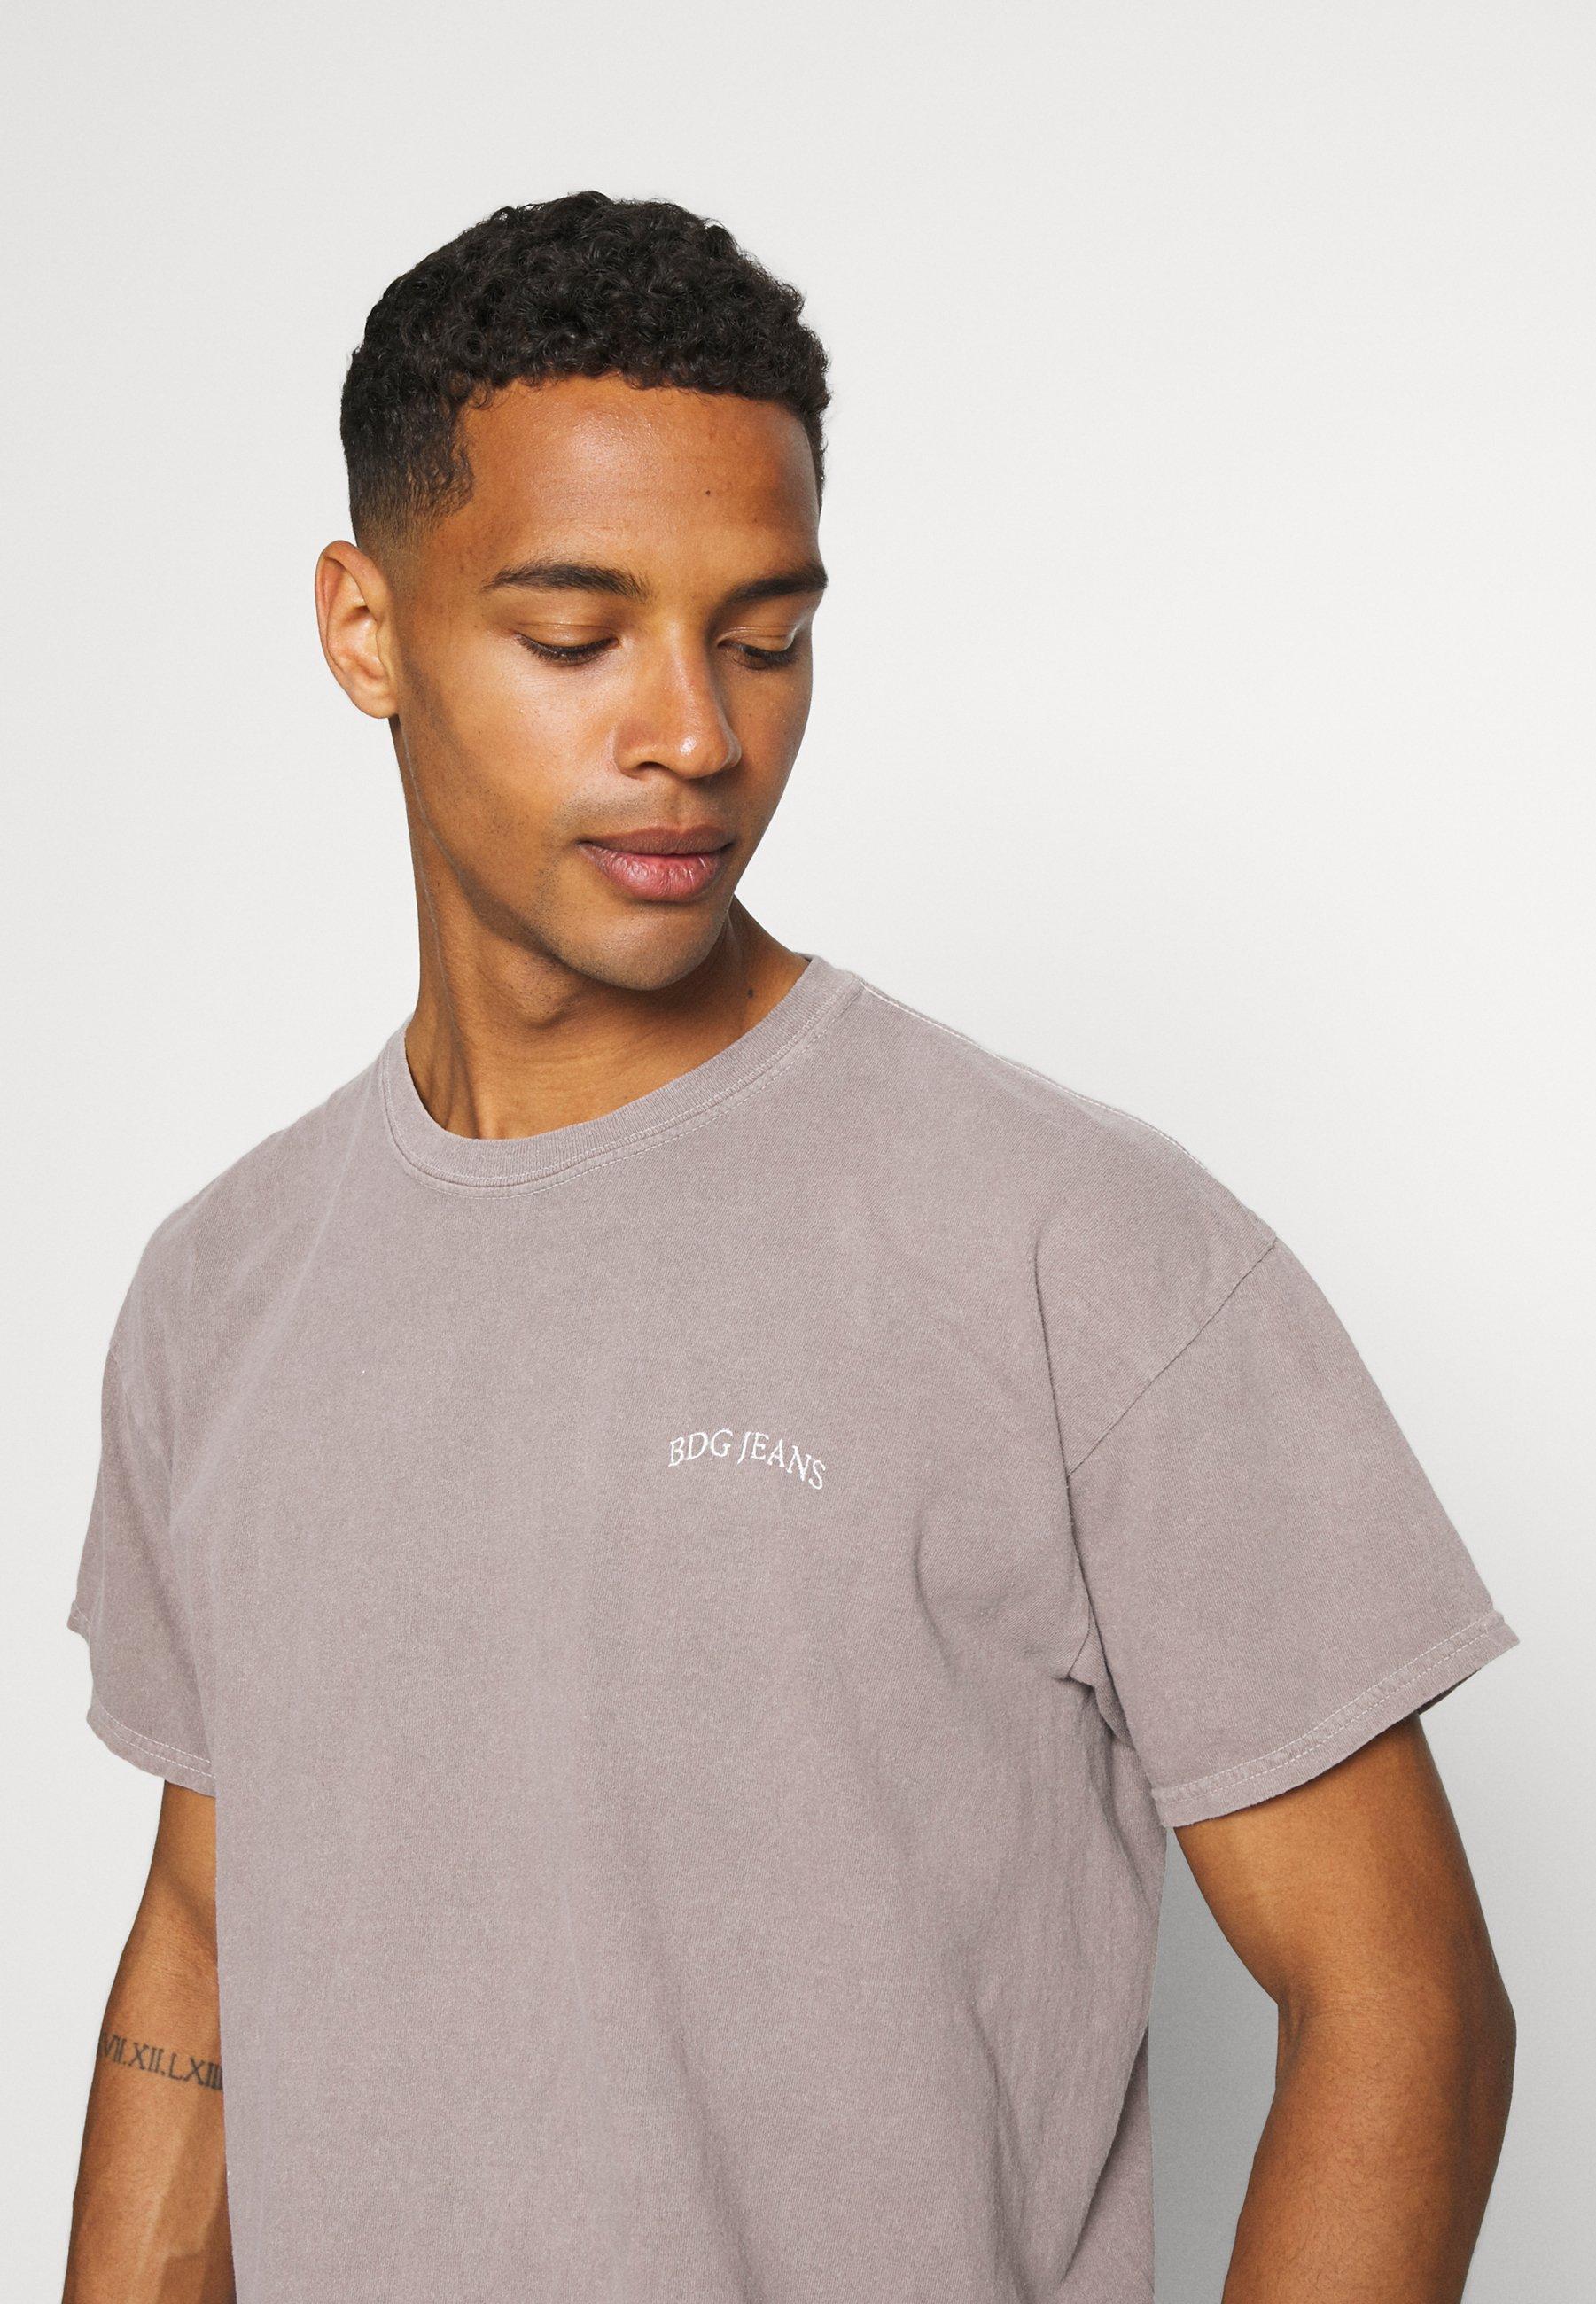 Women LOGO EMBROIDERED TEE UNISEX - Basic T-shirt